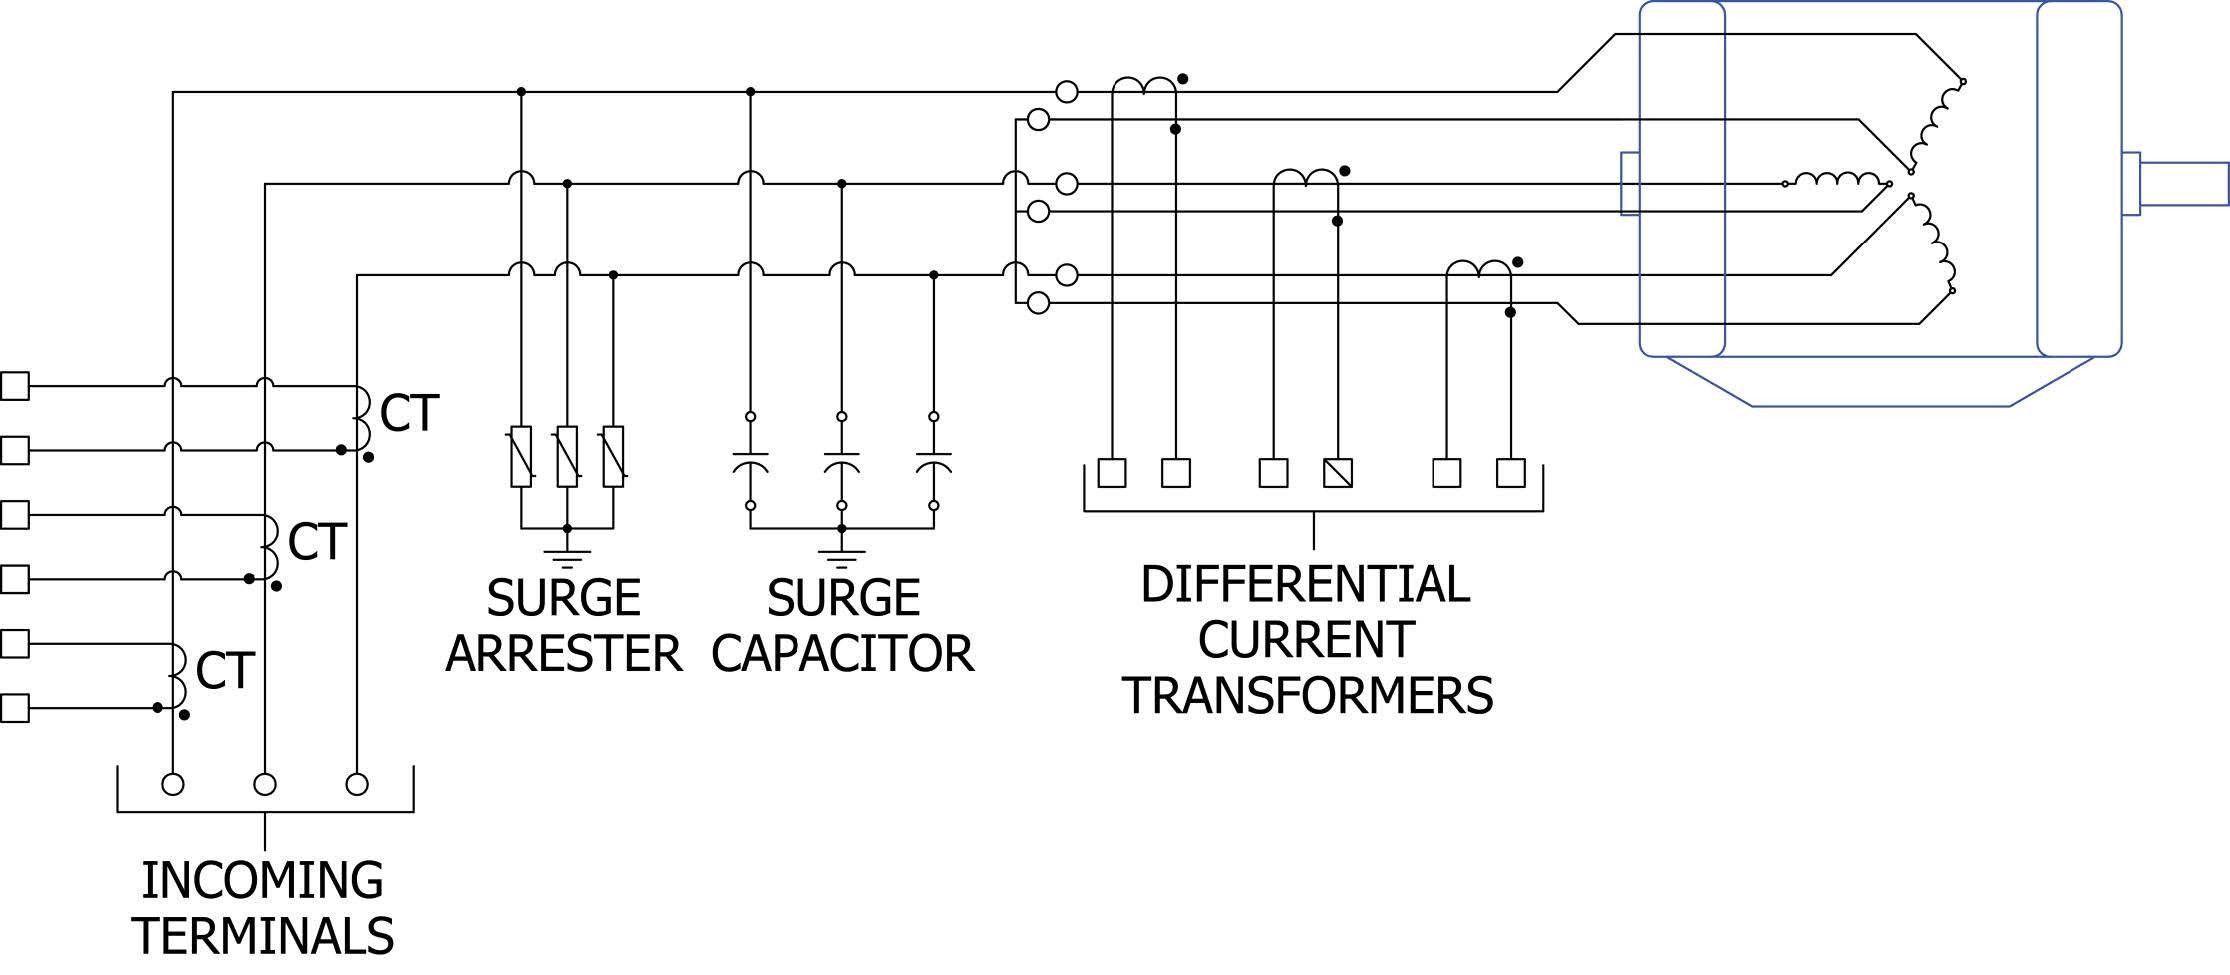 Unique Motor Terminal Connection Diagram Diagram Wiringdiagram Diagramming Diagramm Visuals Visualisation Graphical Diagram Connection Capacitors